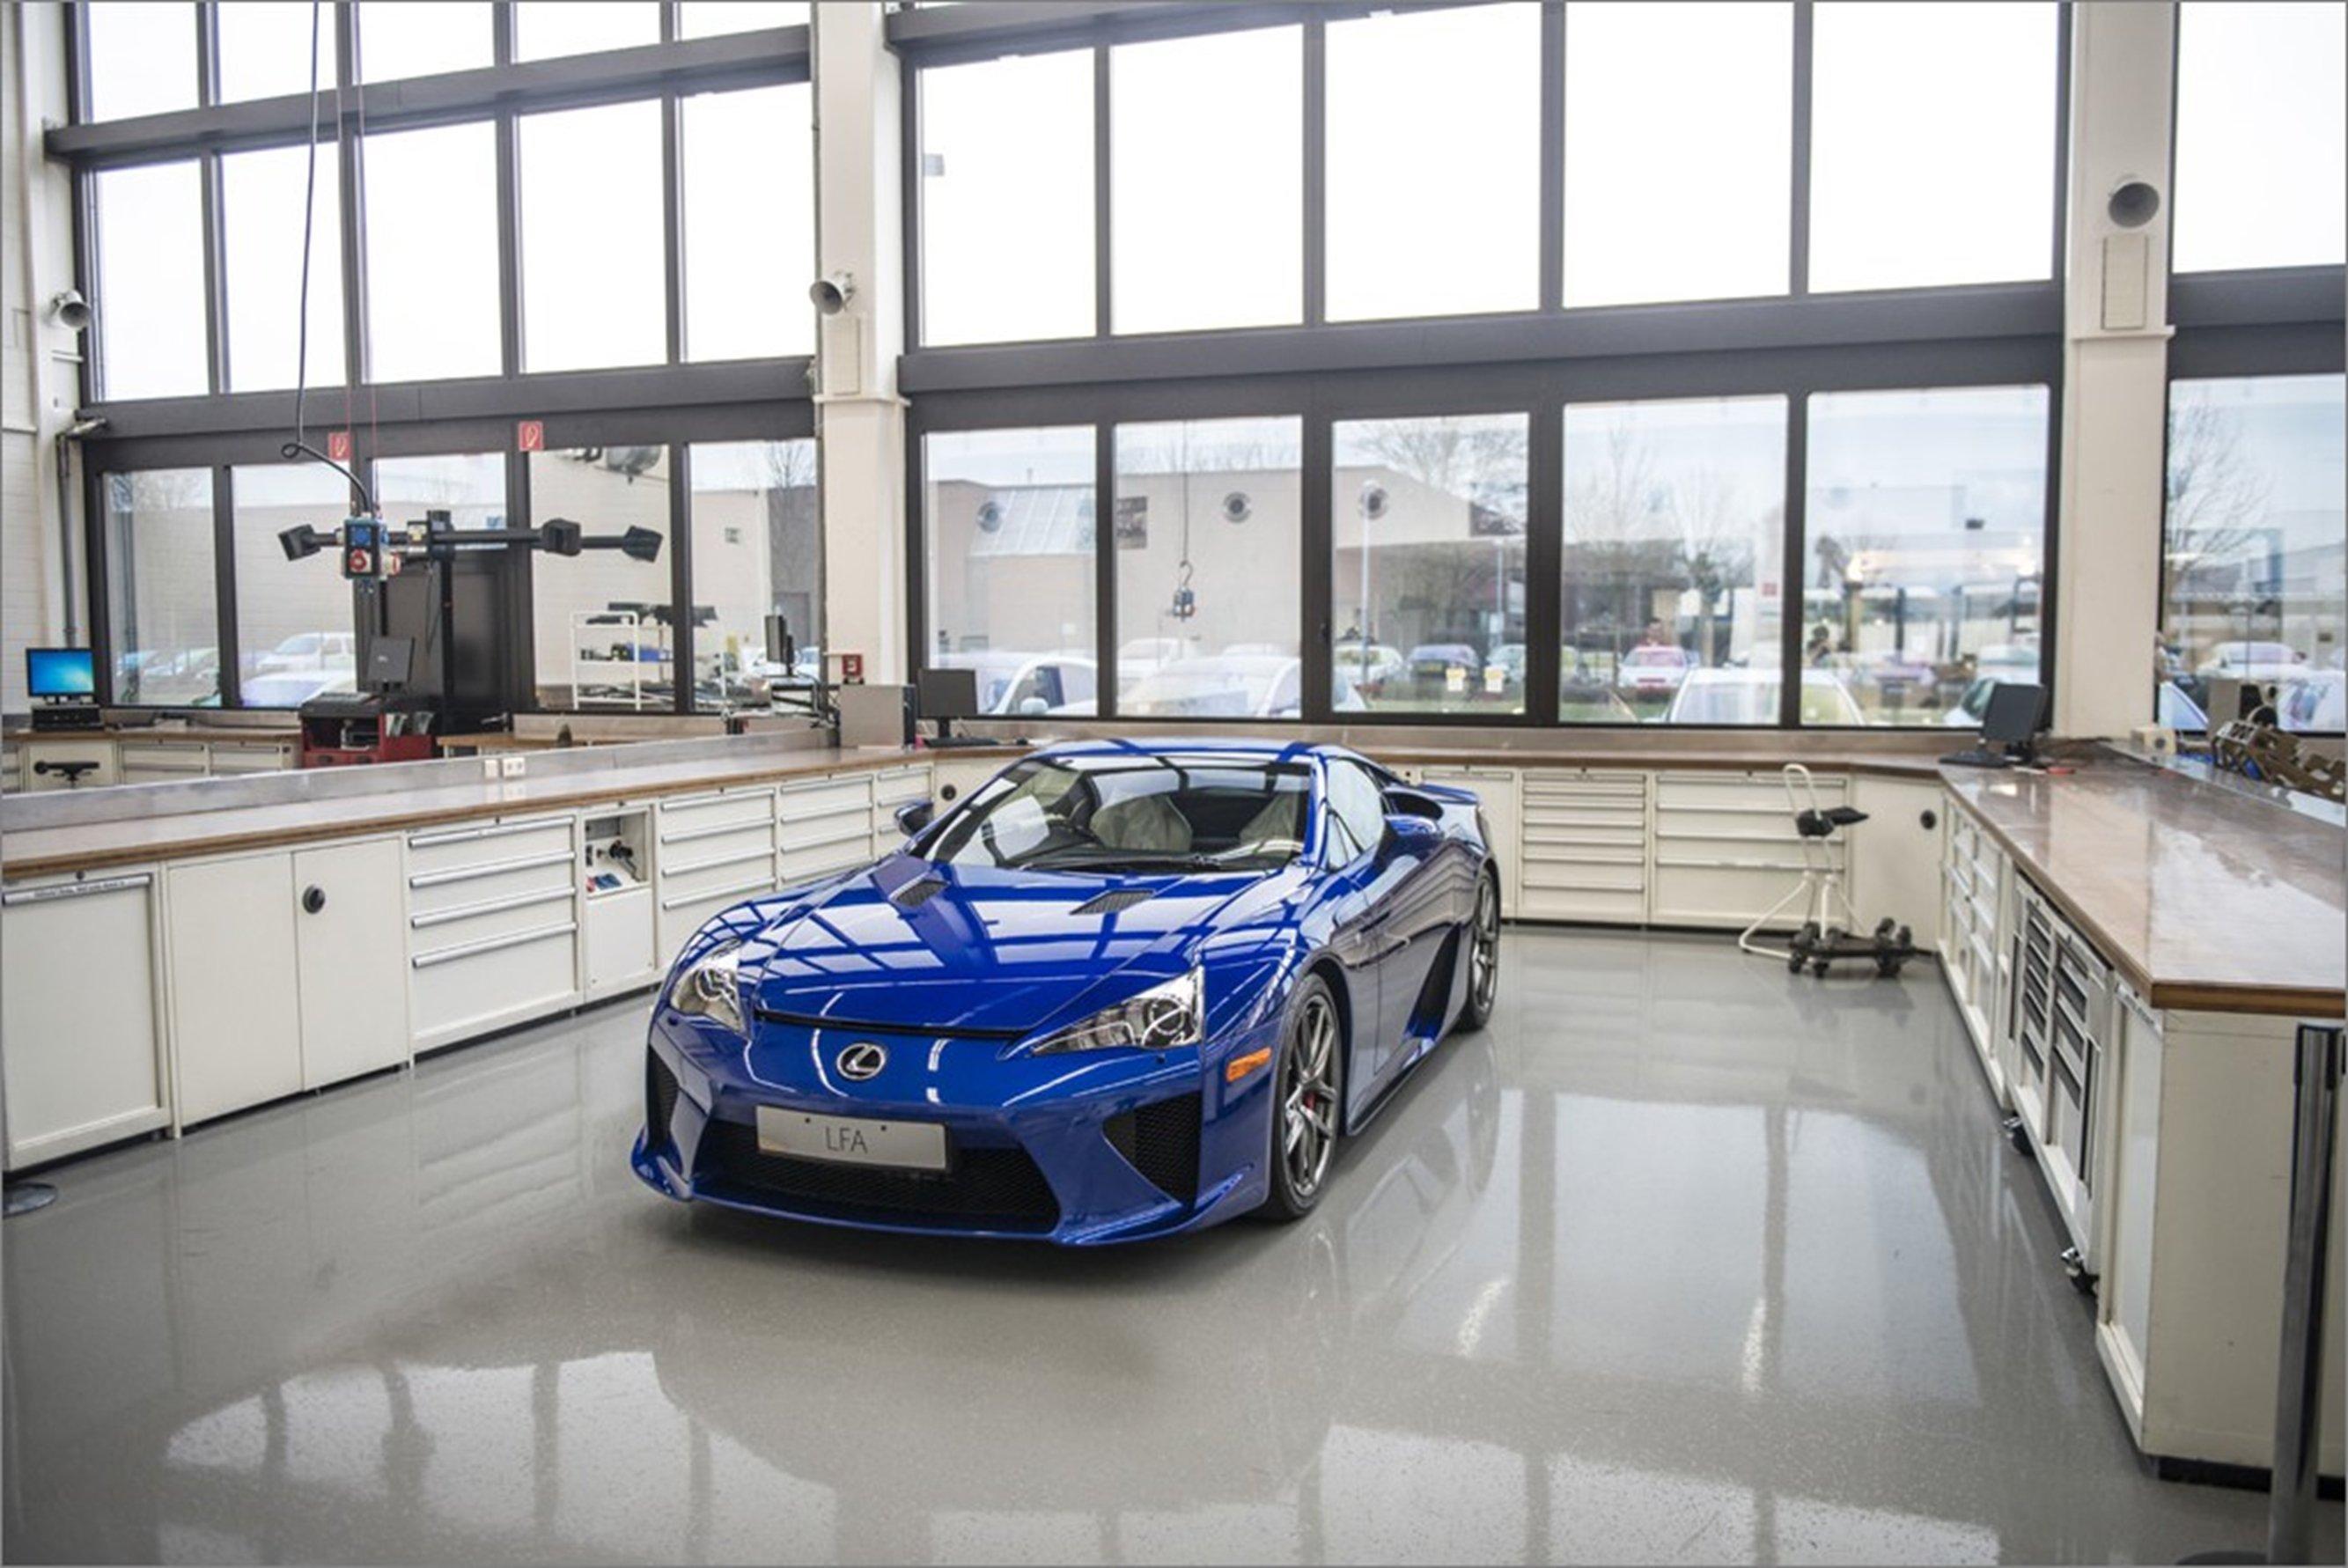 Dream Car Garage: Lexus LFA In The Toyota MotorsportAis